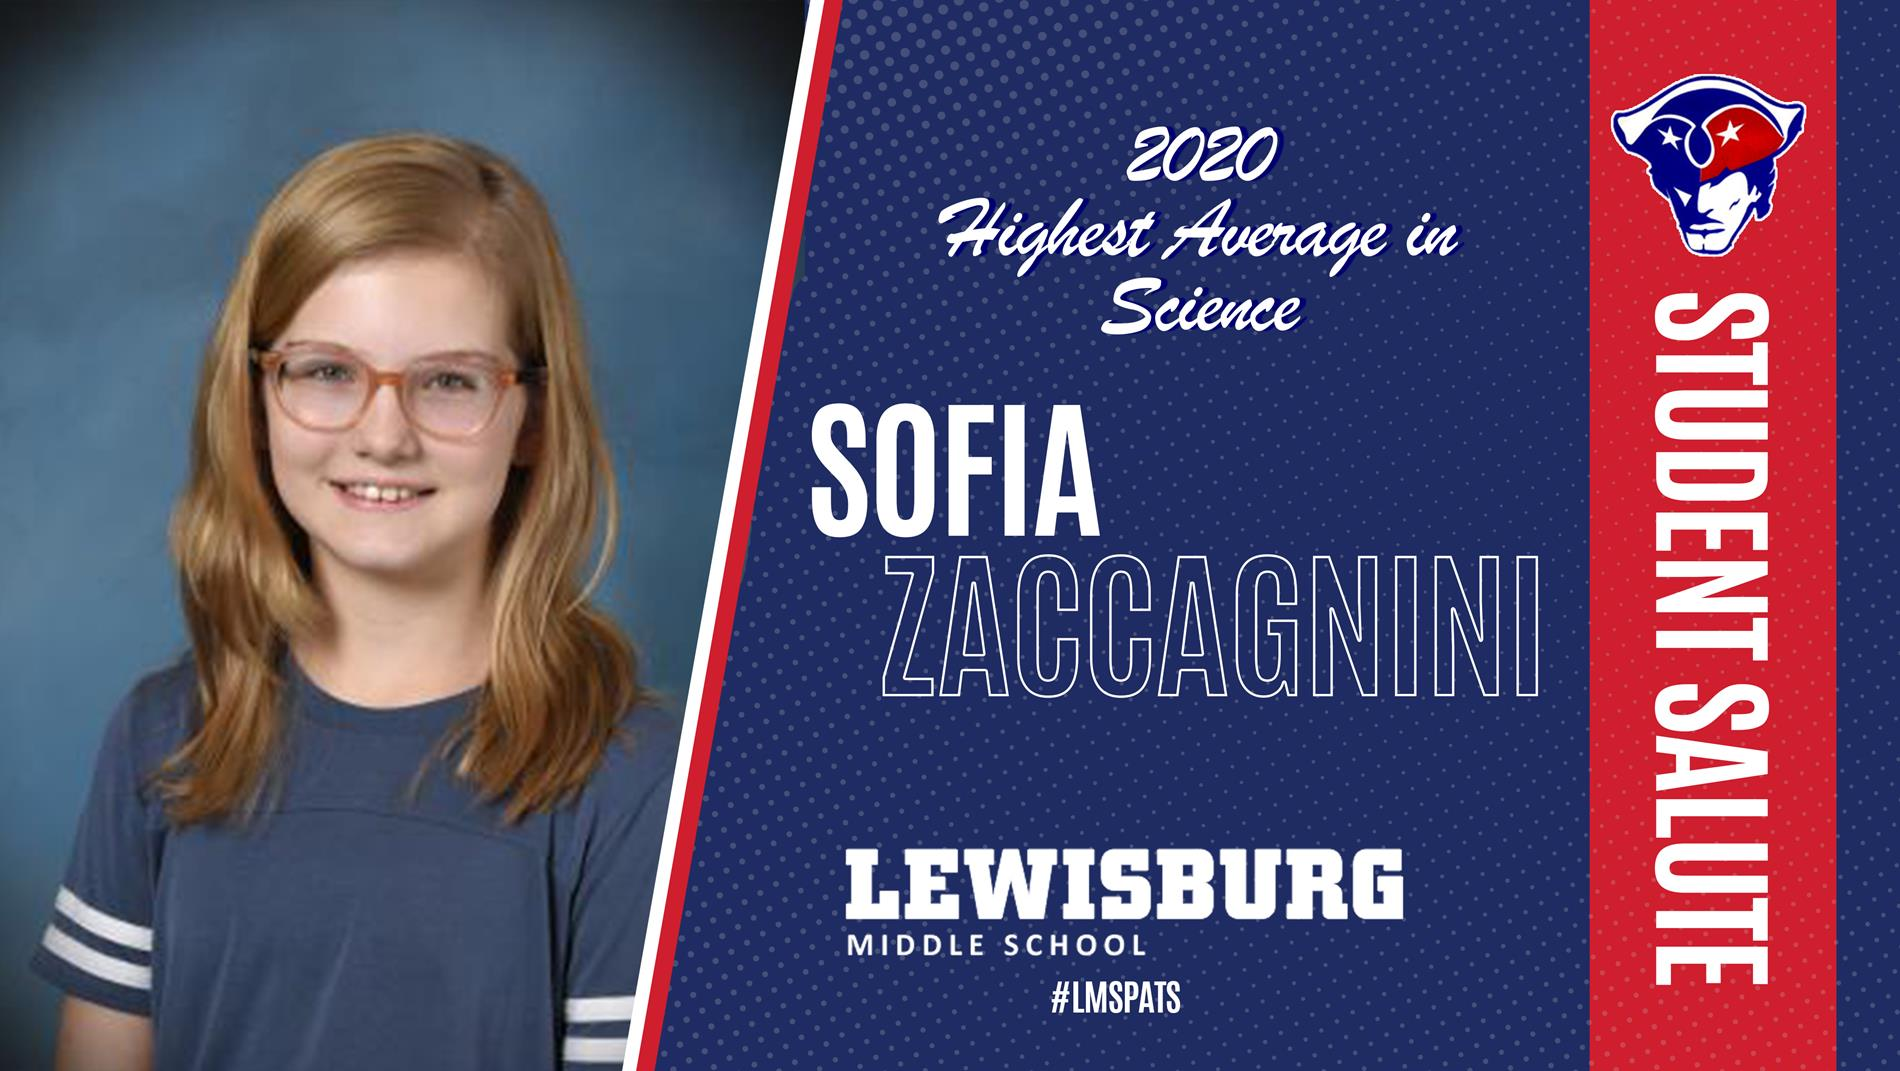 Congrats Sofia!